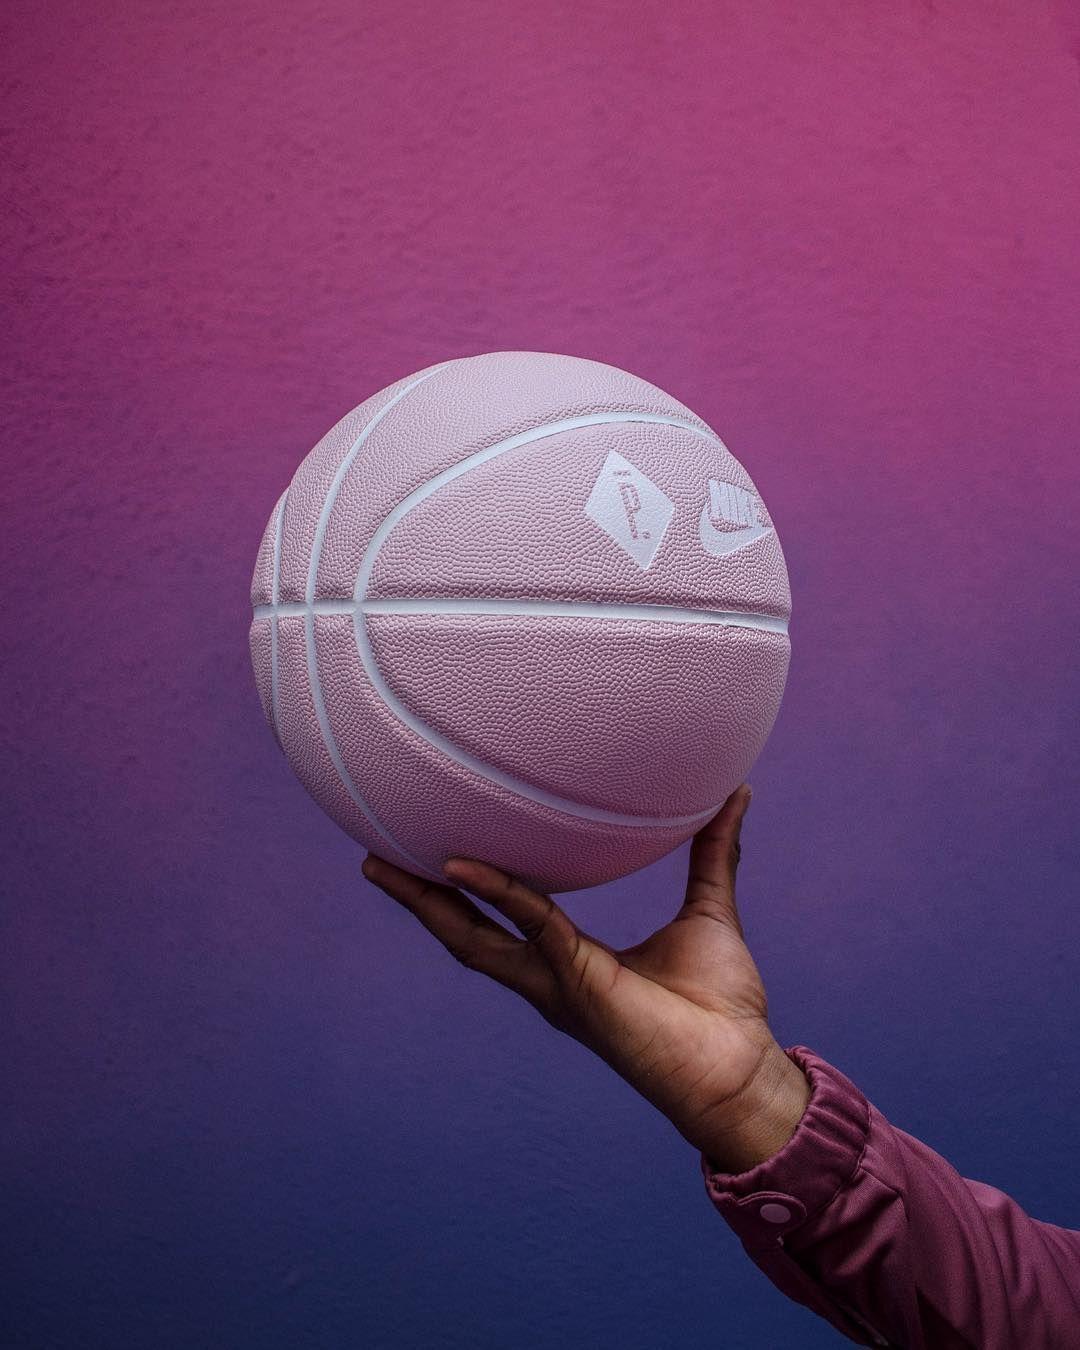 A Look Inside The World S Most Beautiful Basketball Court Good Sports Pink Basketball Basketball Wallpaper Basketball Videos